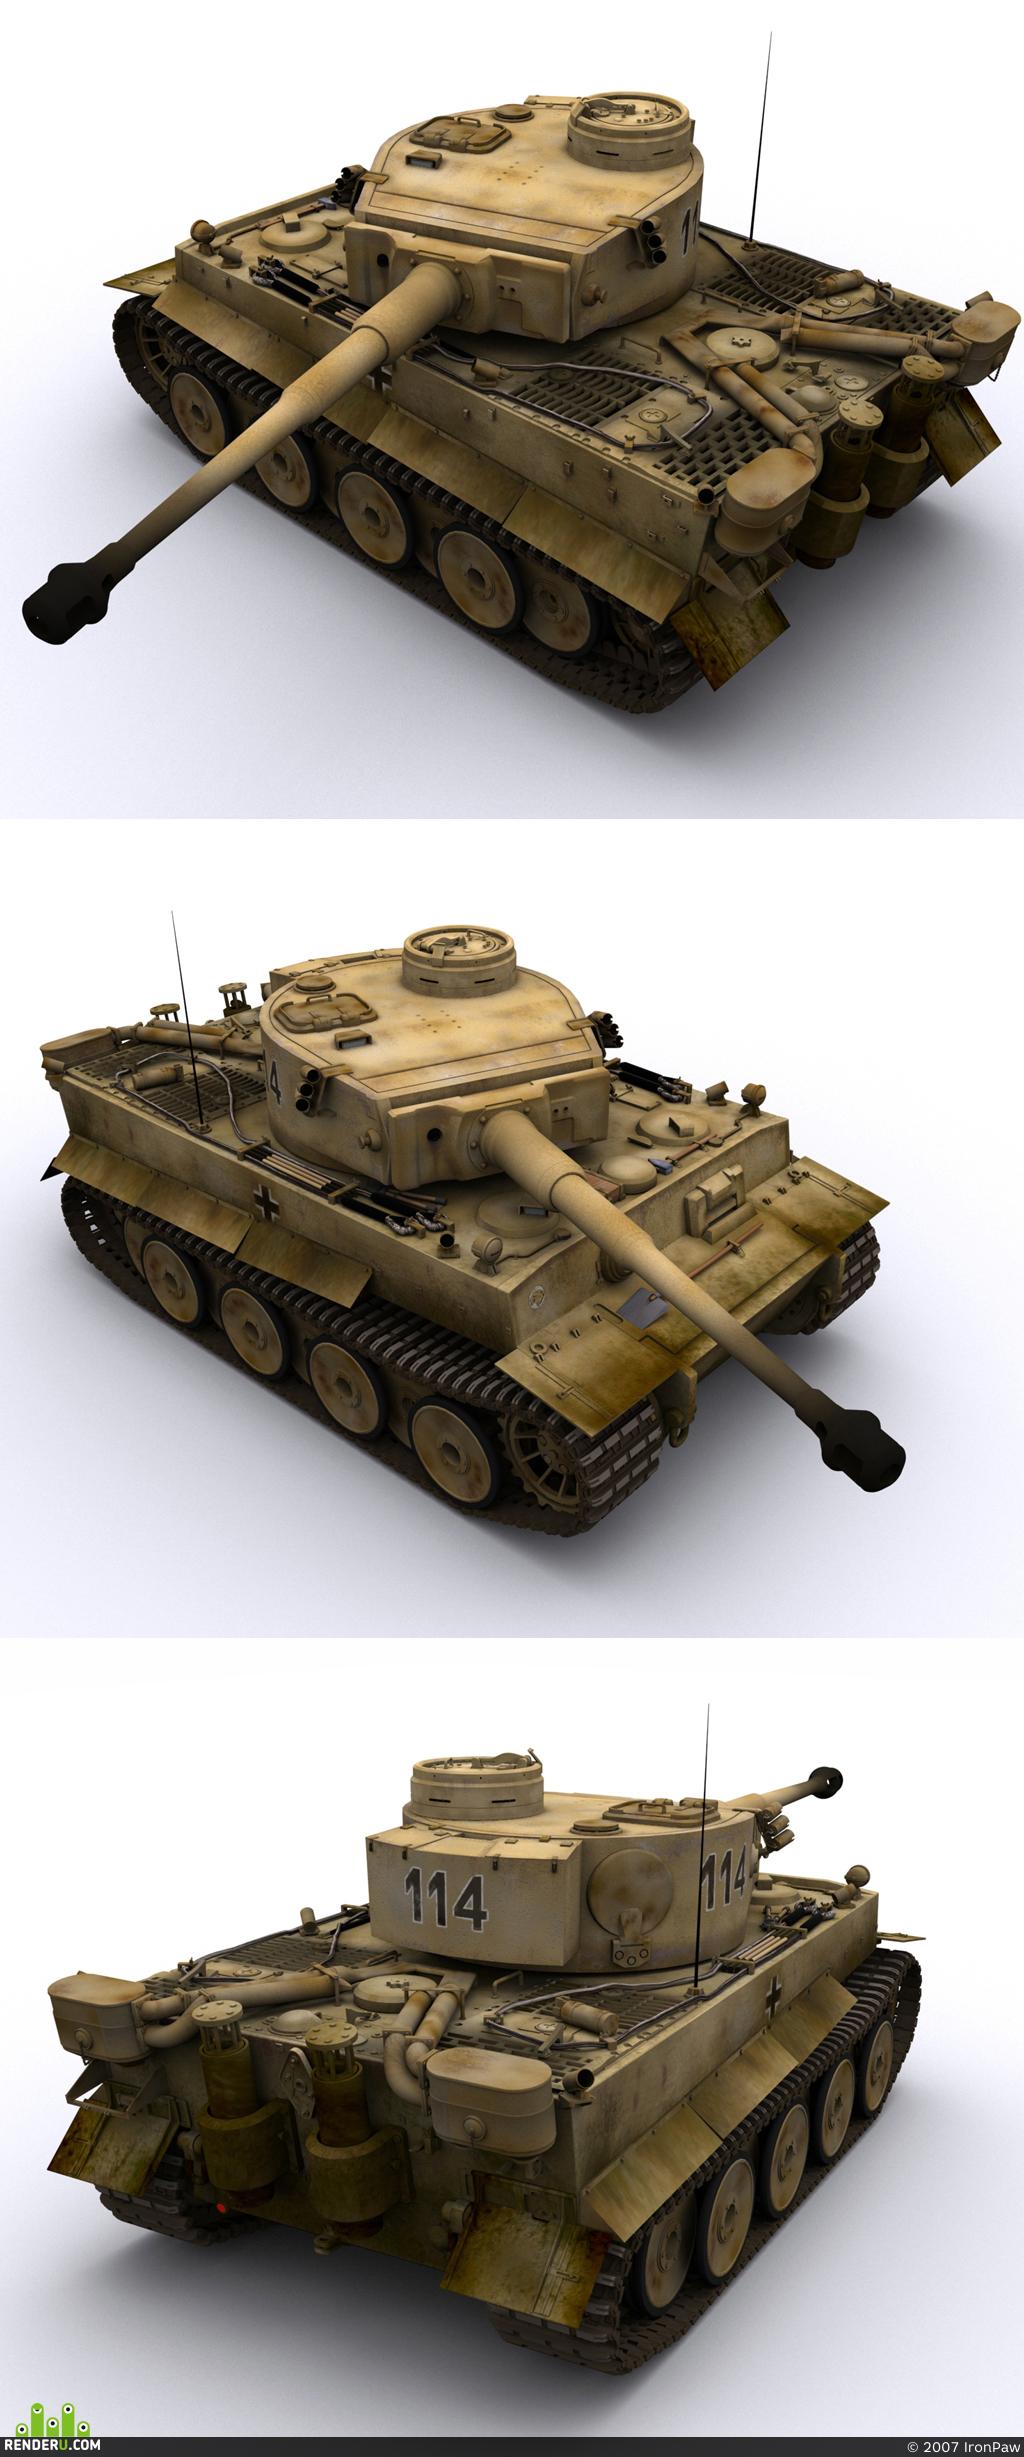 "preview Pz.Kpfw.VI(H) ""Tiger"" / 503 abt. Kursk Battle 1943."